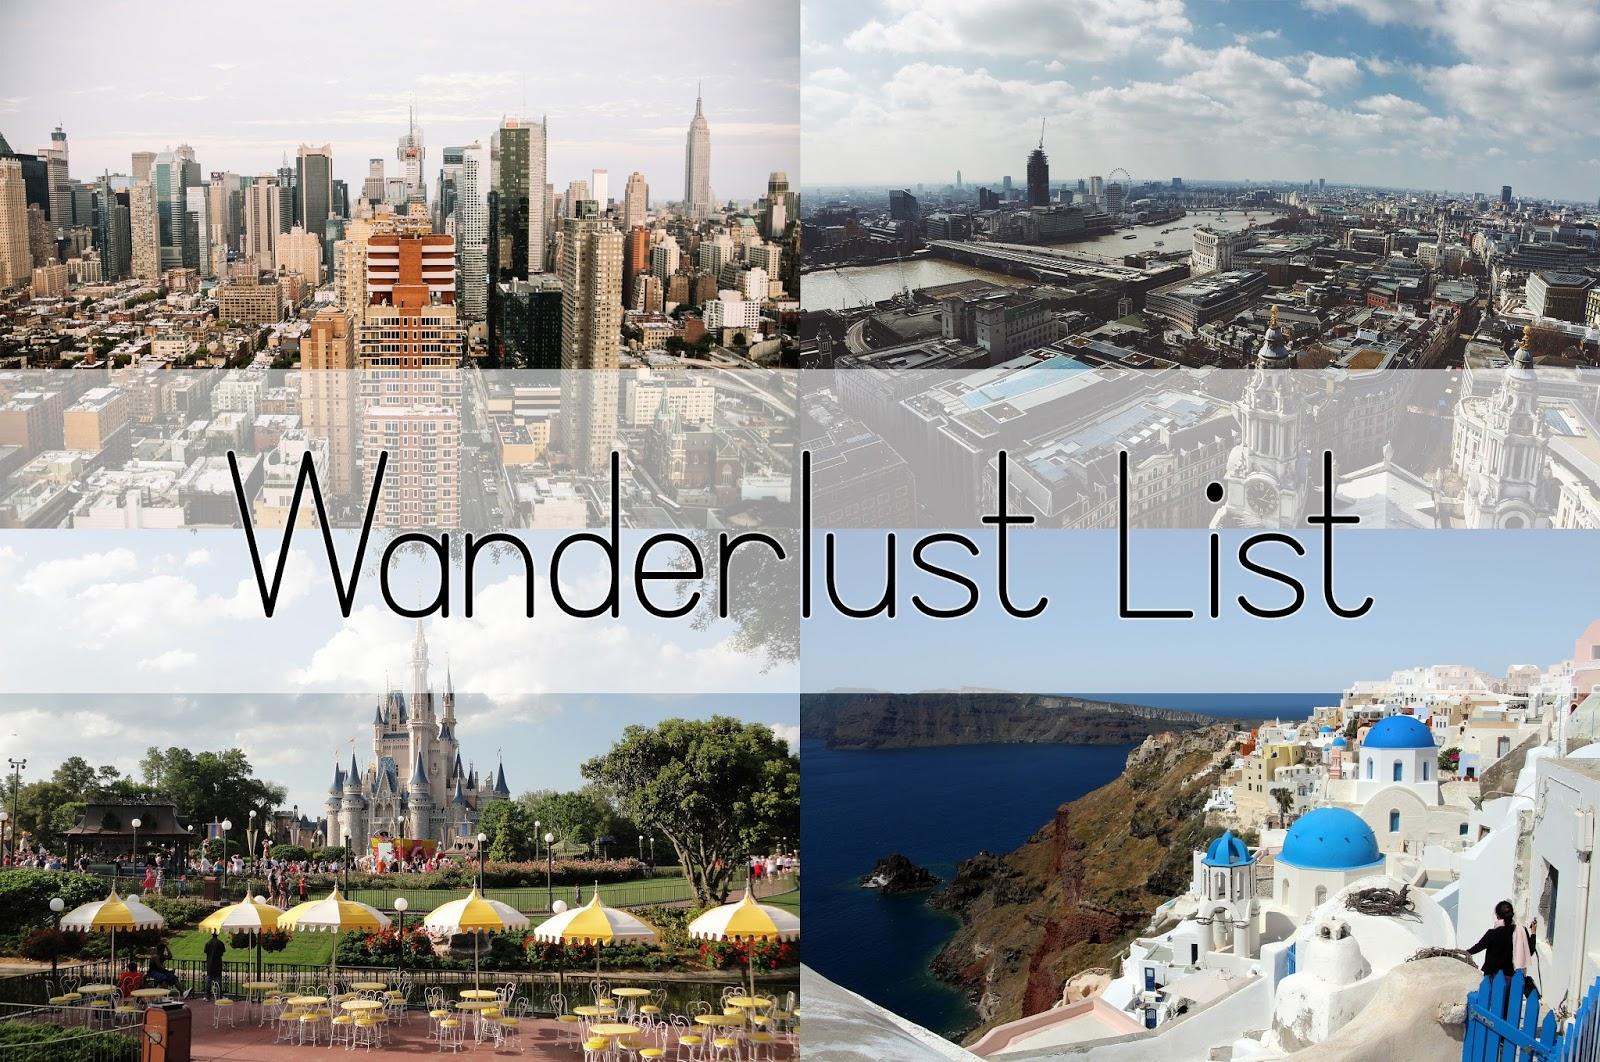 Wanderlust List